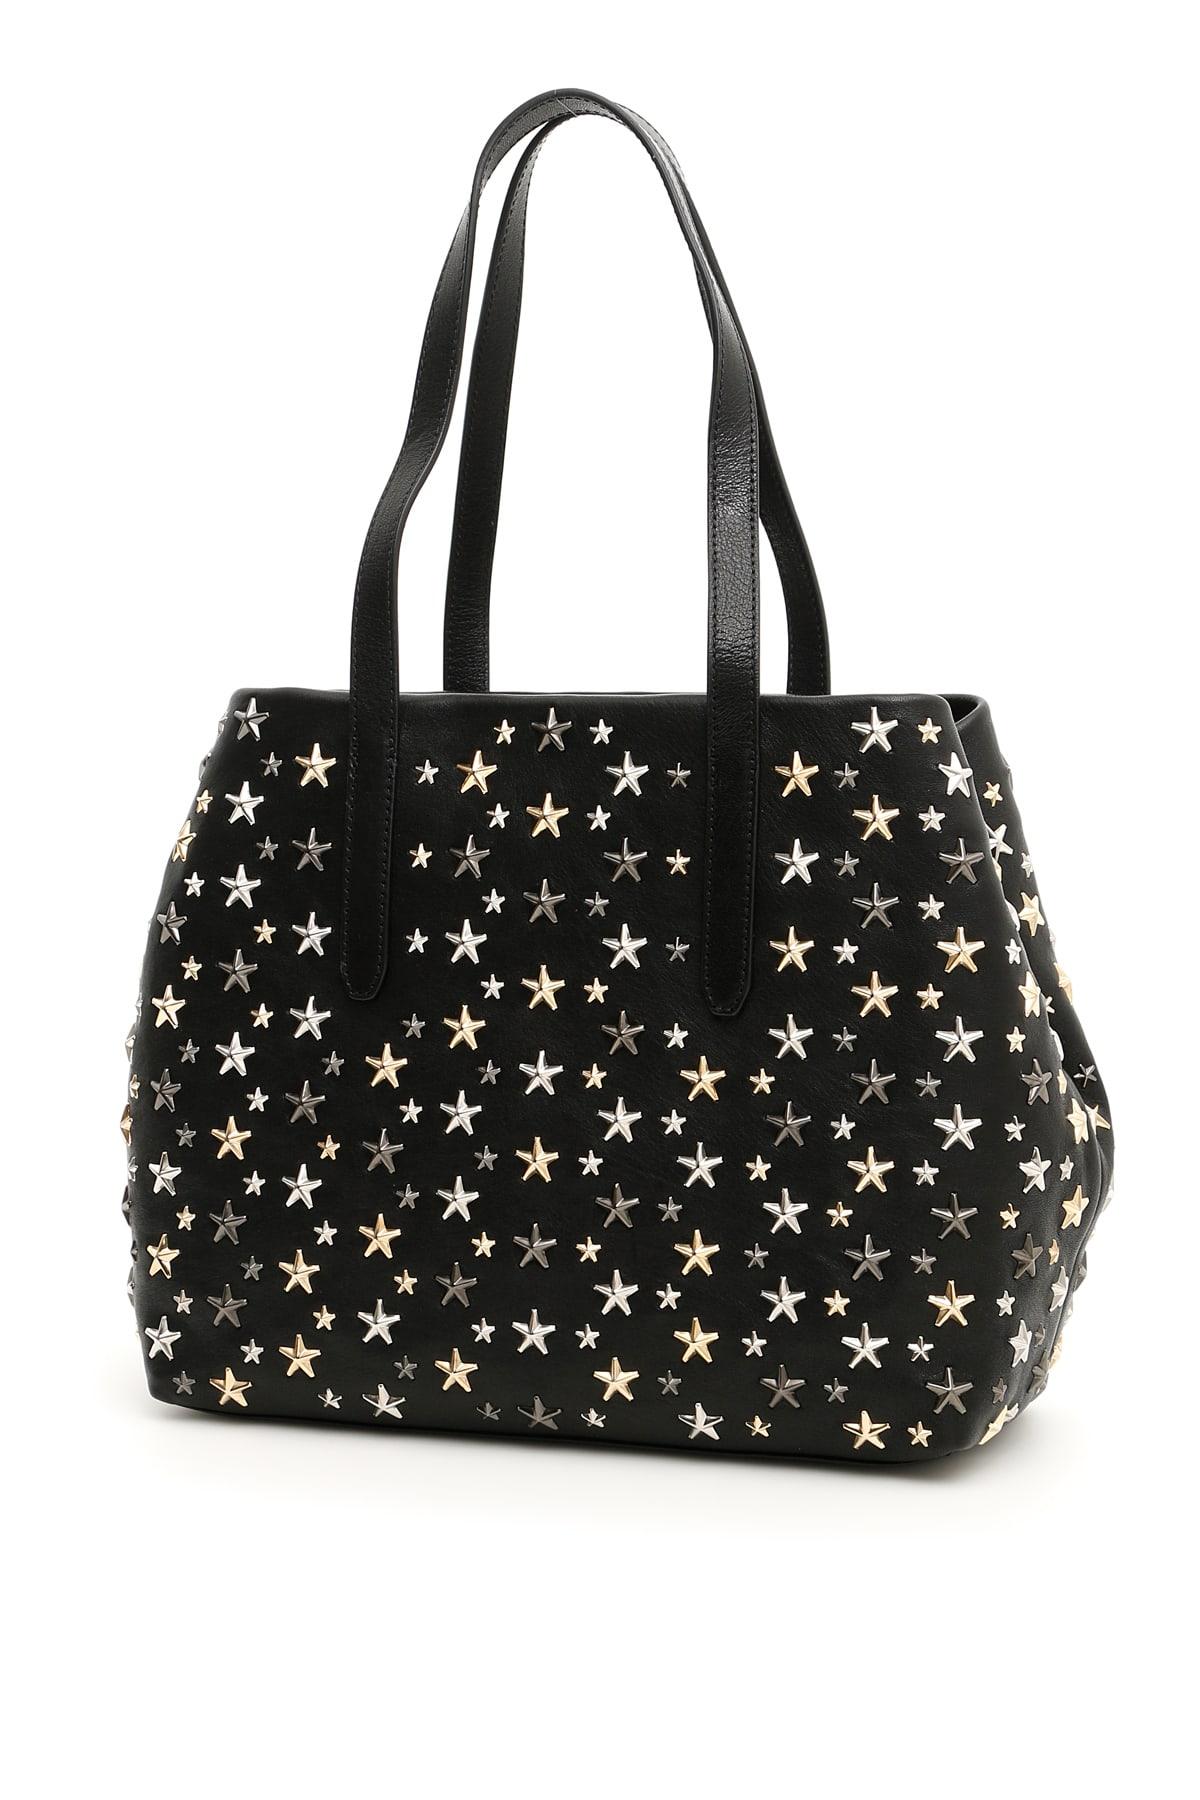 Jimmy Choo Shopping Bag With Stars Sofia M